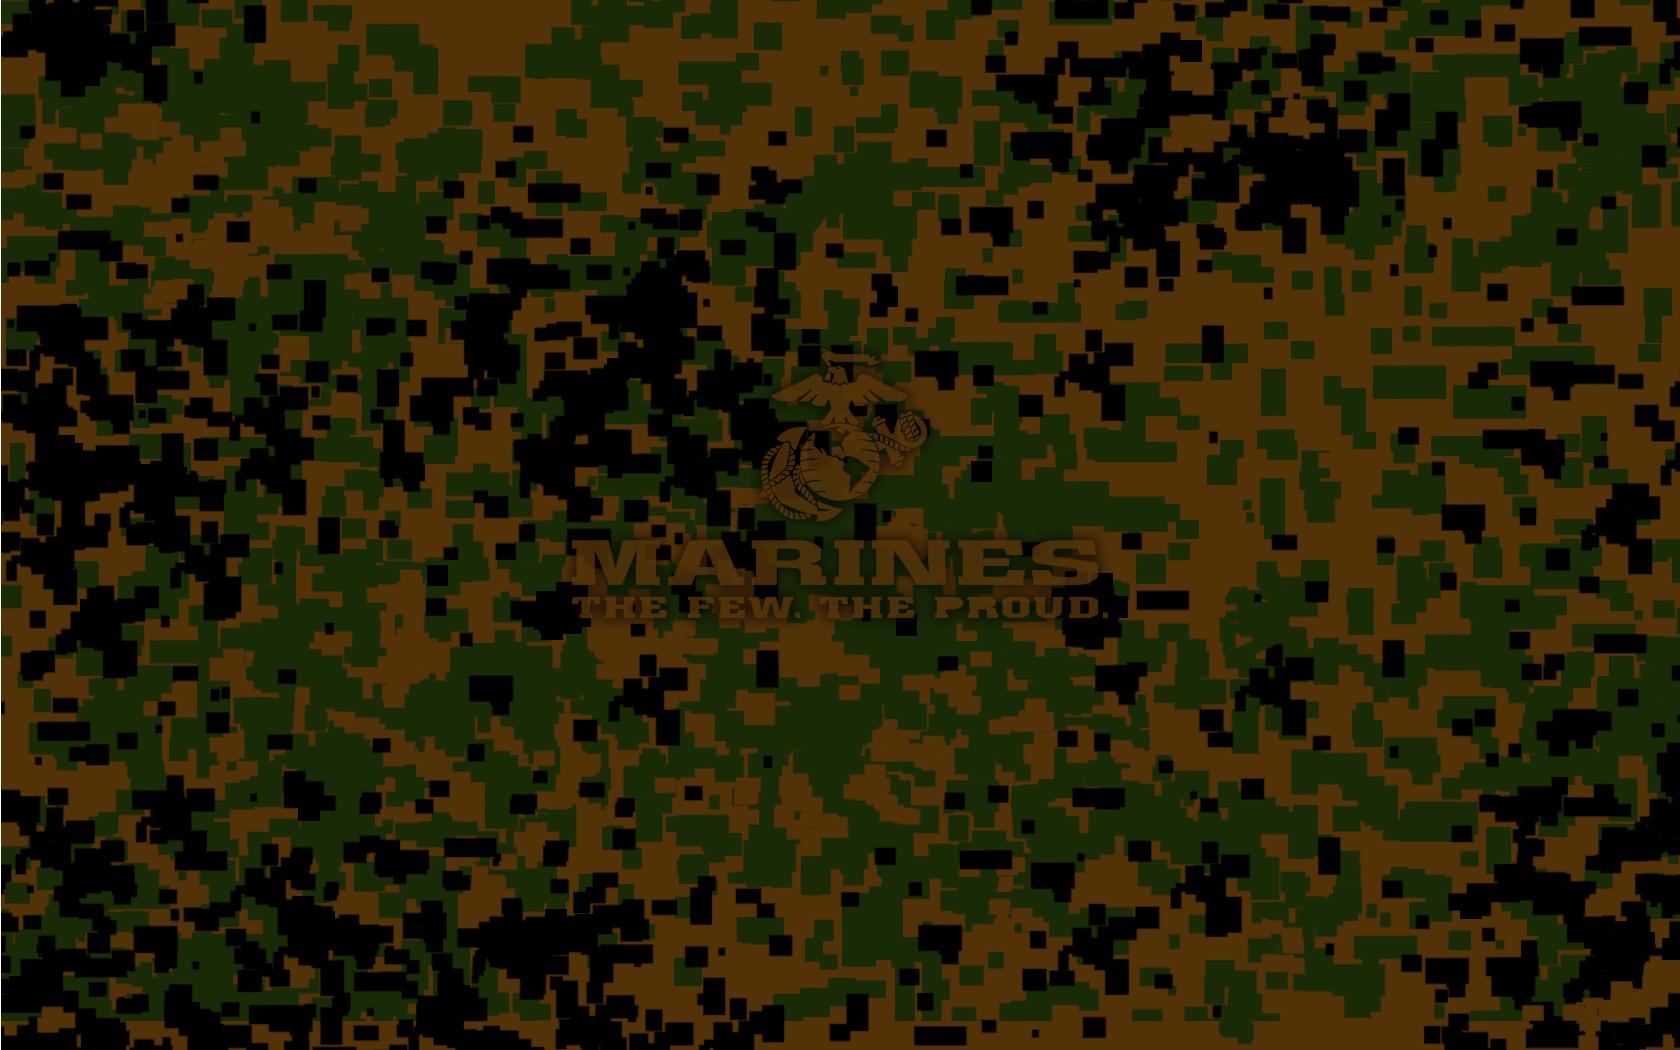 usmc camo download army gallery wallpaper full hd wallpapers wallpaper 1680x1050